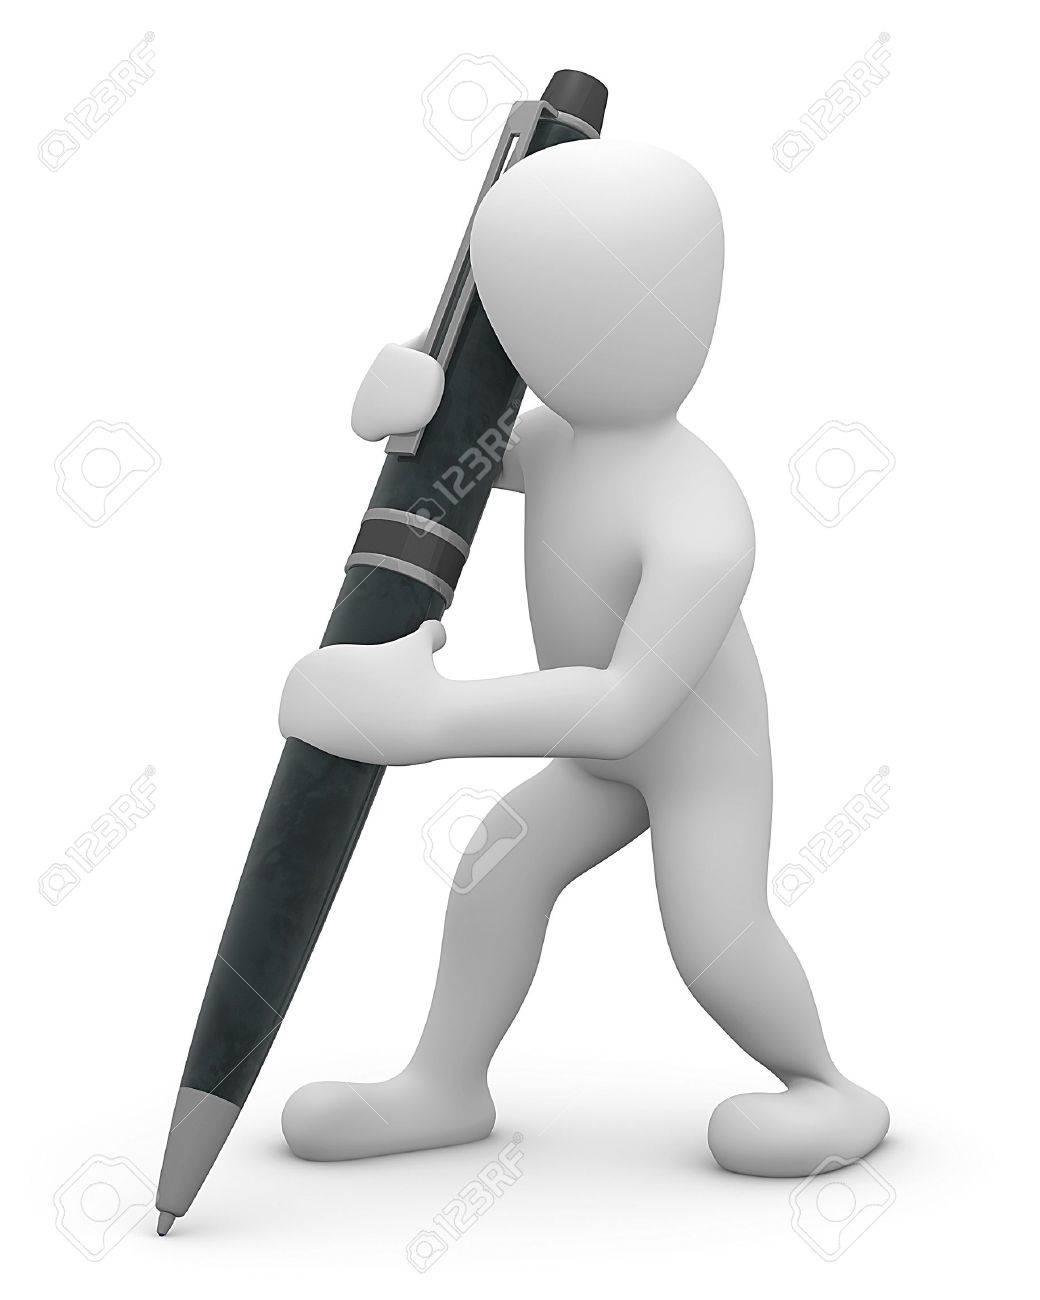 Paperwritings Support  Borko Writing Stock Photo Writing Logo People Index?term Papercatidsiteid